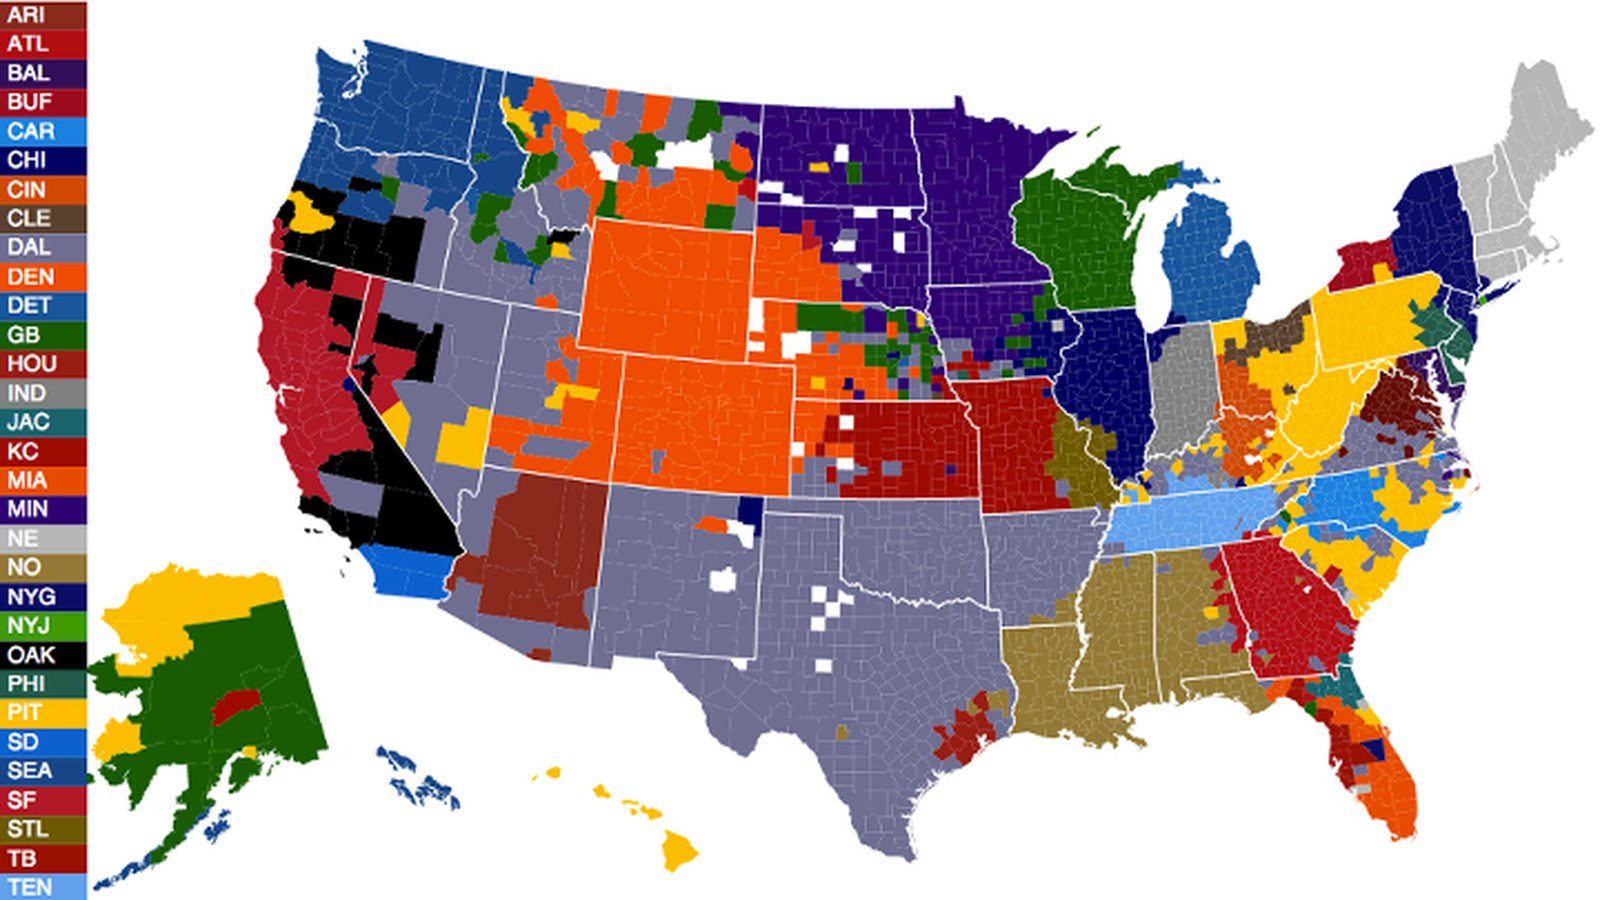 The Only NFL Fandom Map That Doesnt Suck SBNationcom - Atlanta falcons us fan map